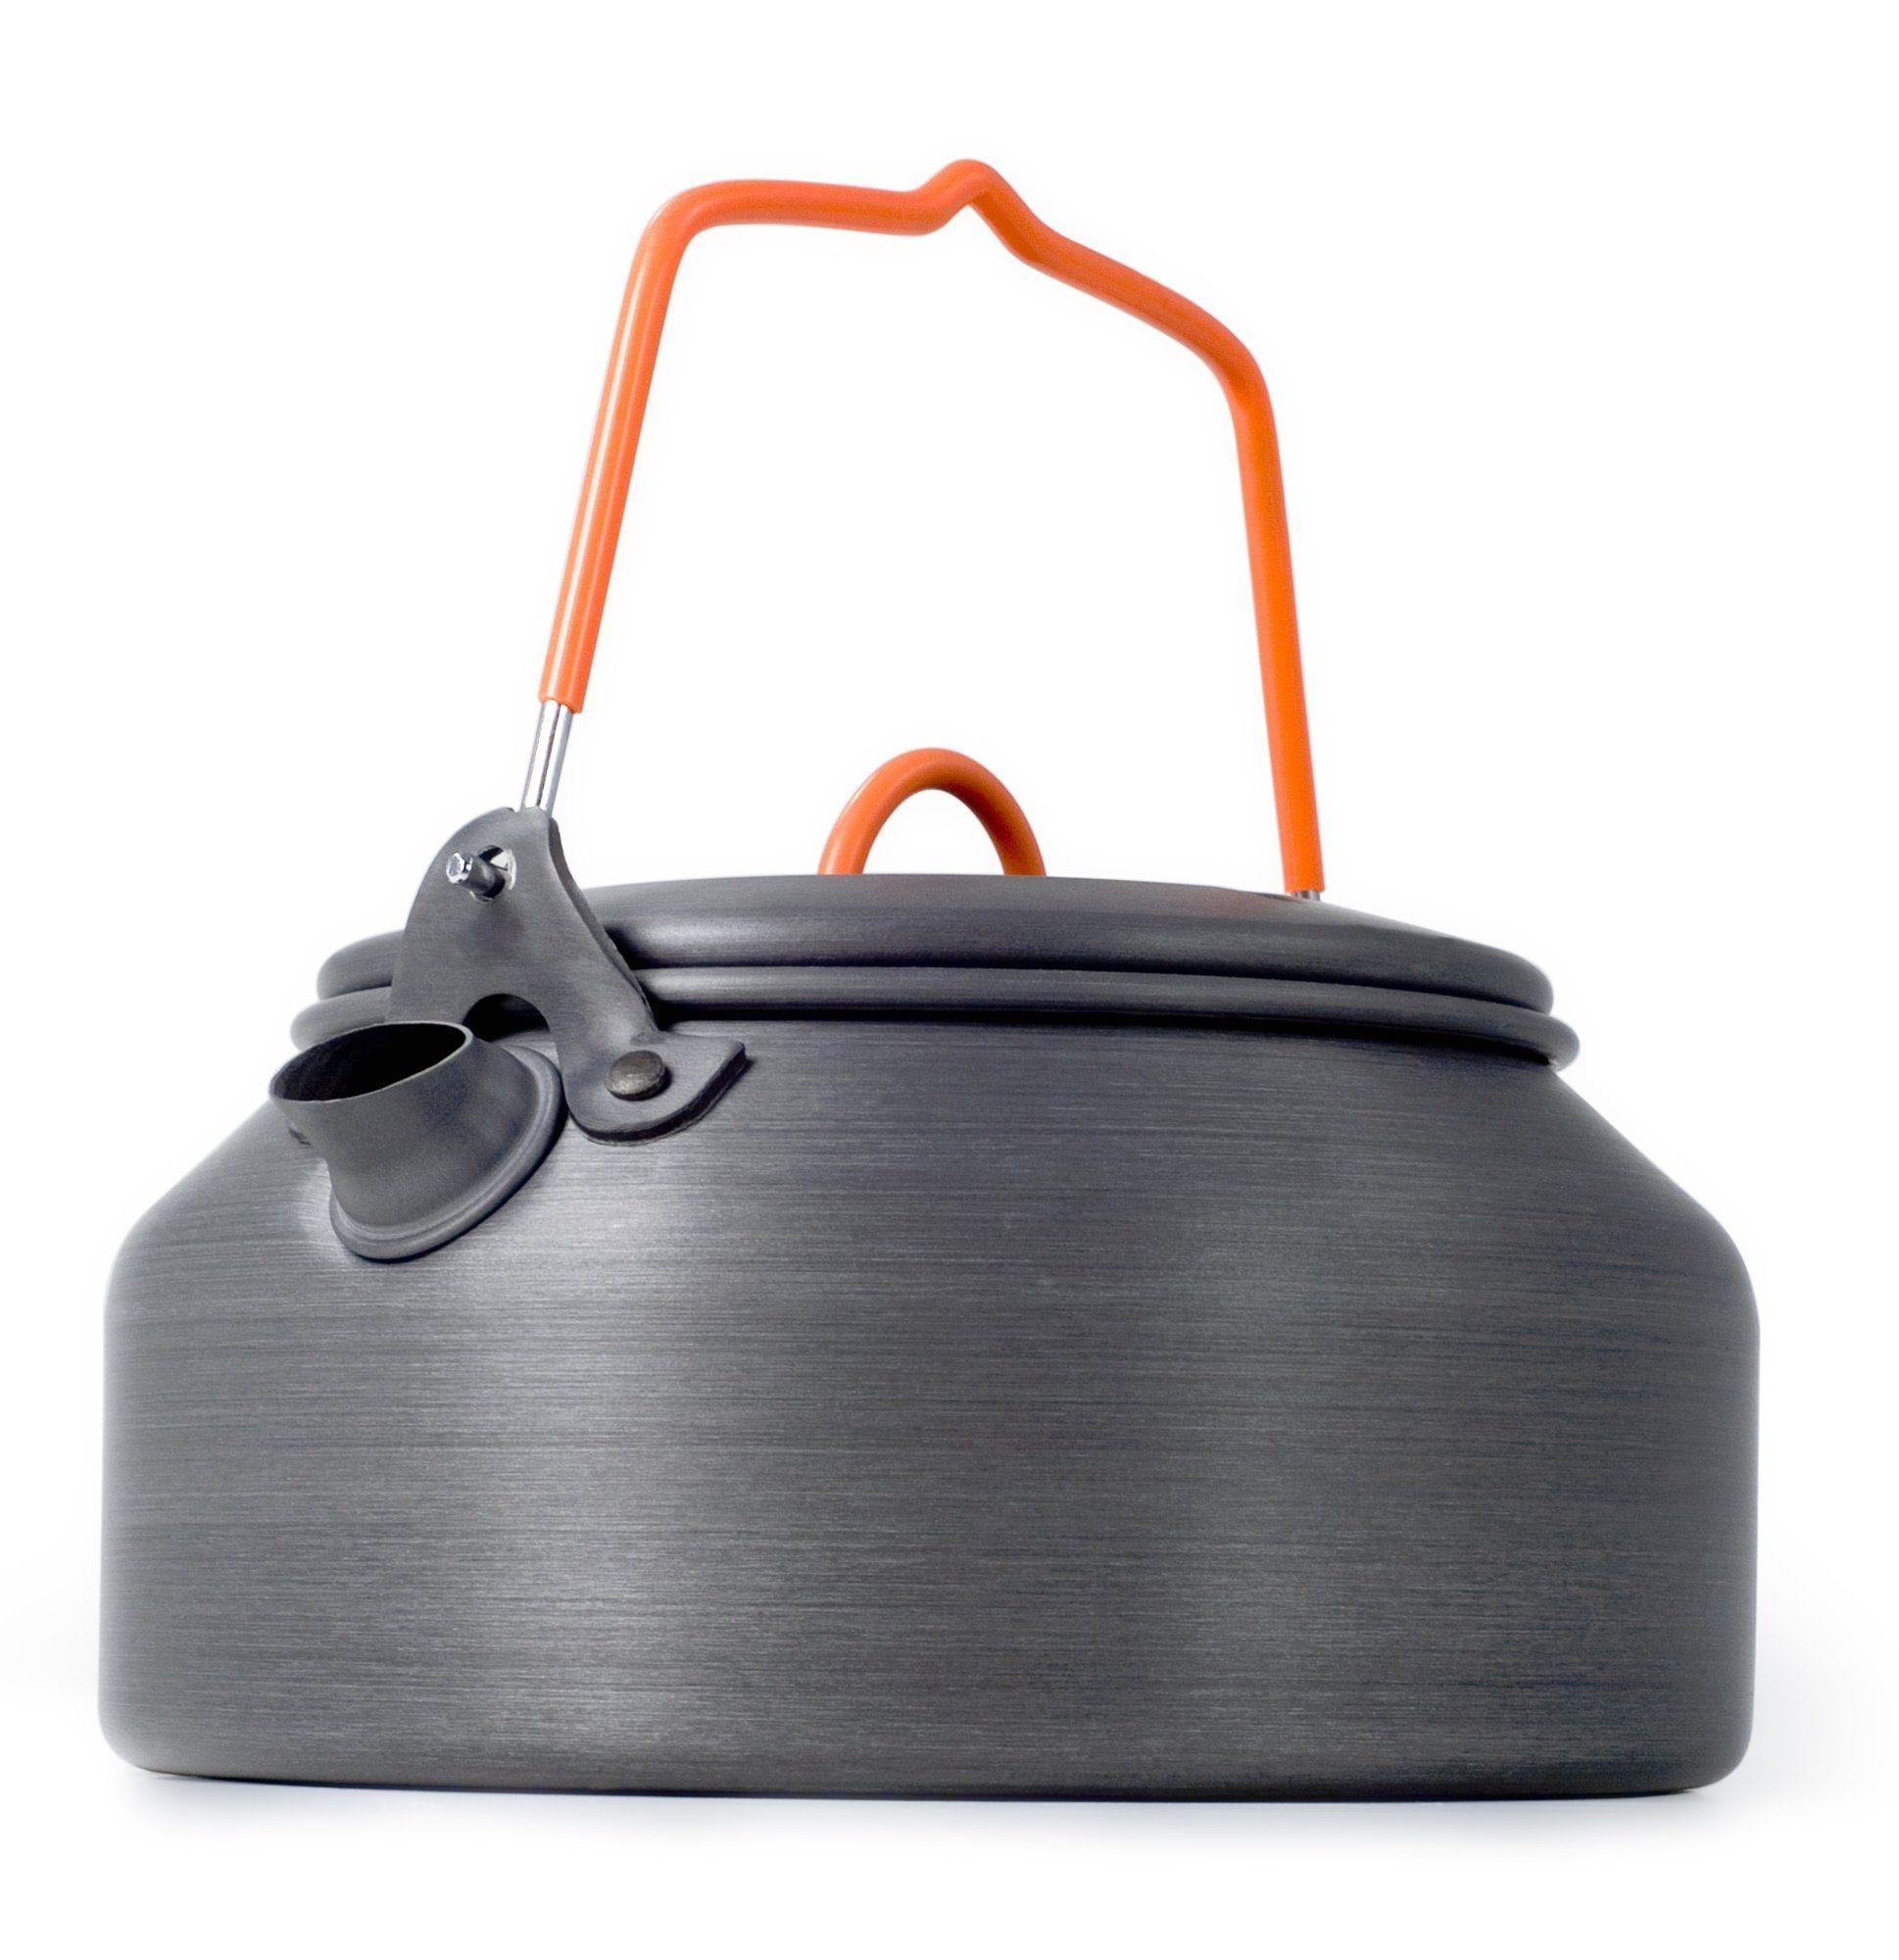 GSI Camping-Geschirr »Tea Kettle Halulite 1000ml«